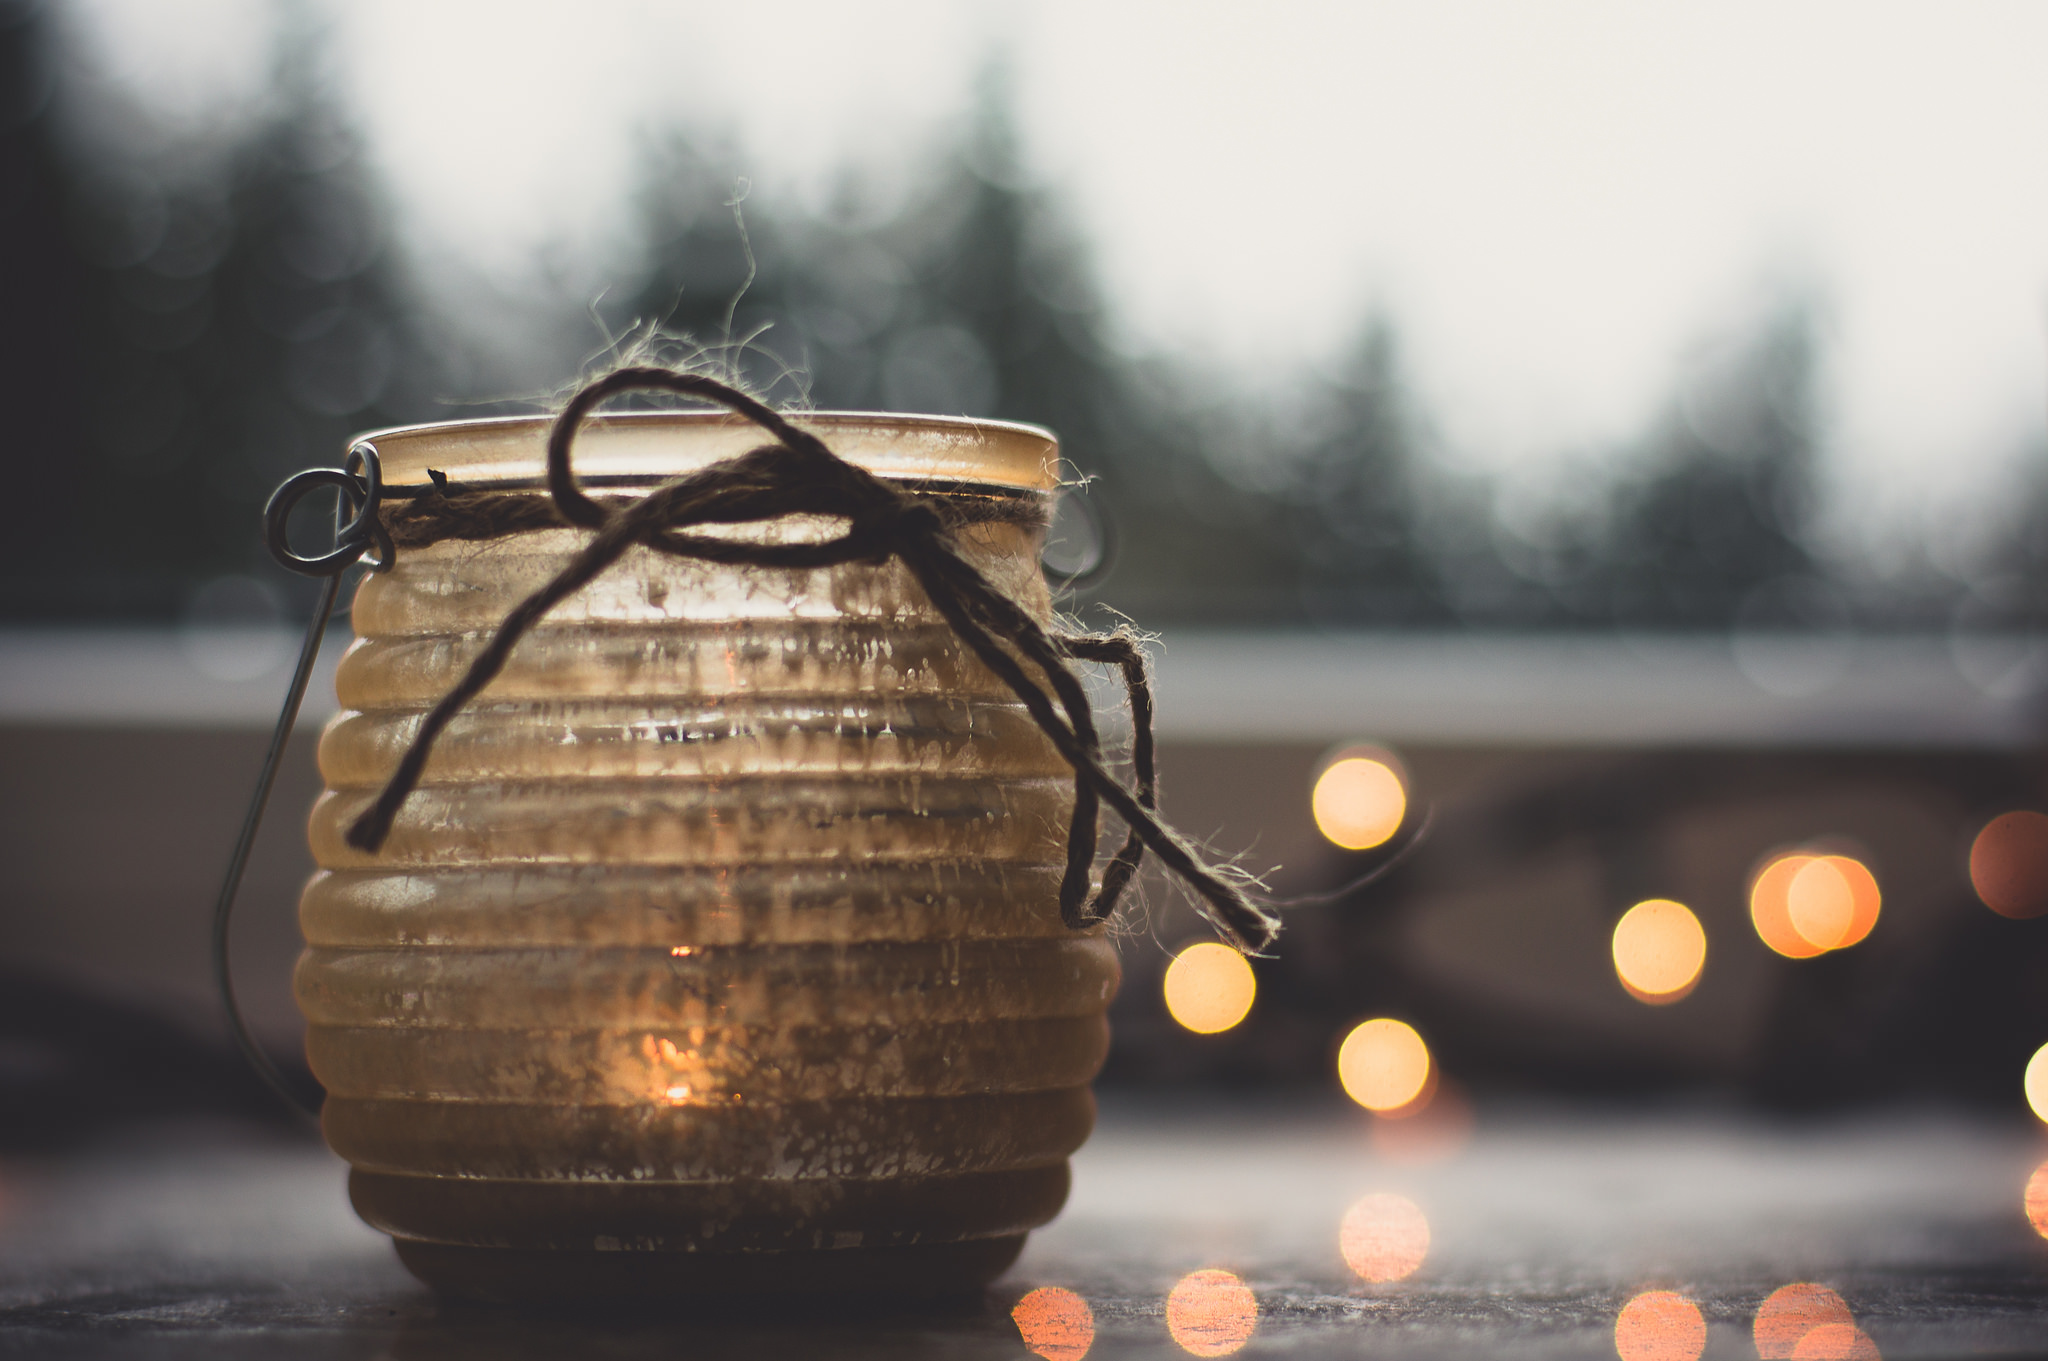 Winter moments wallpaper winter candle jar bokeh lights cozy warm 2048x1361